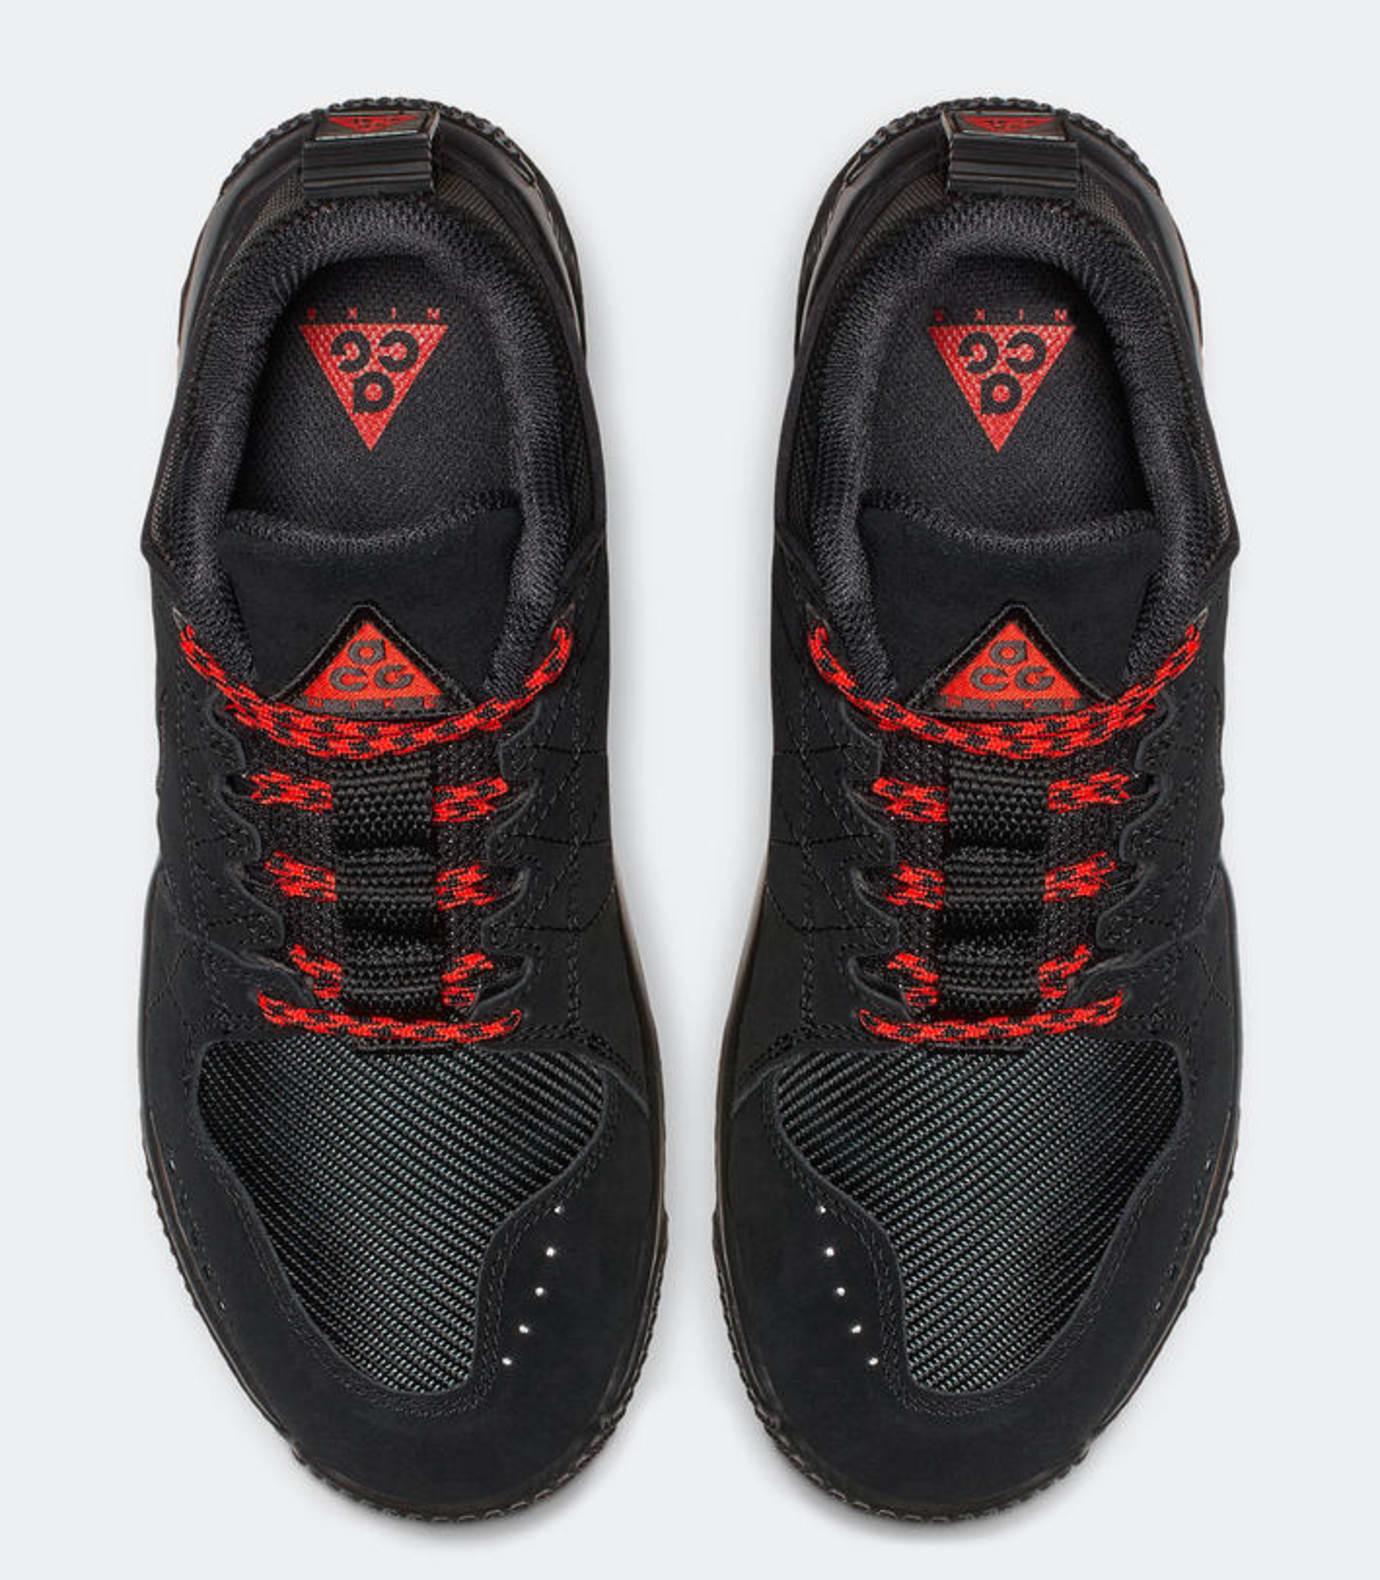 Nike ACG Dog Mountain 'Black/Red' (Top)